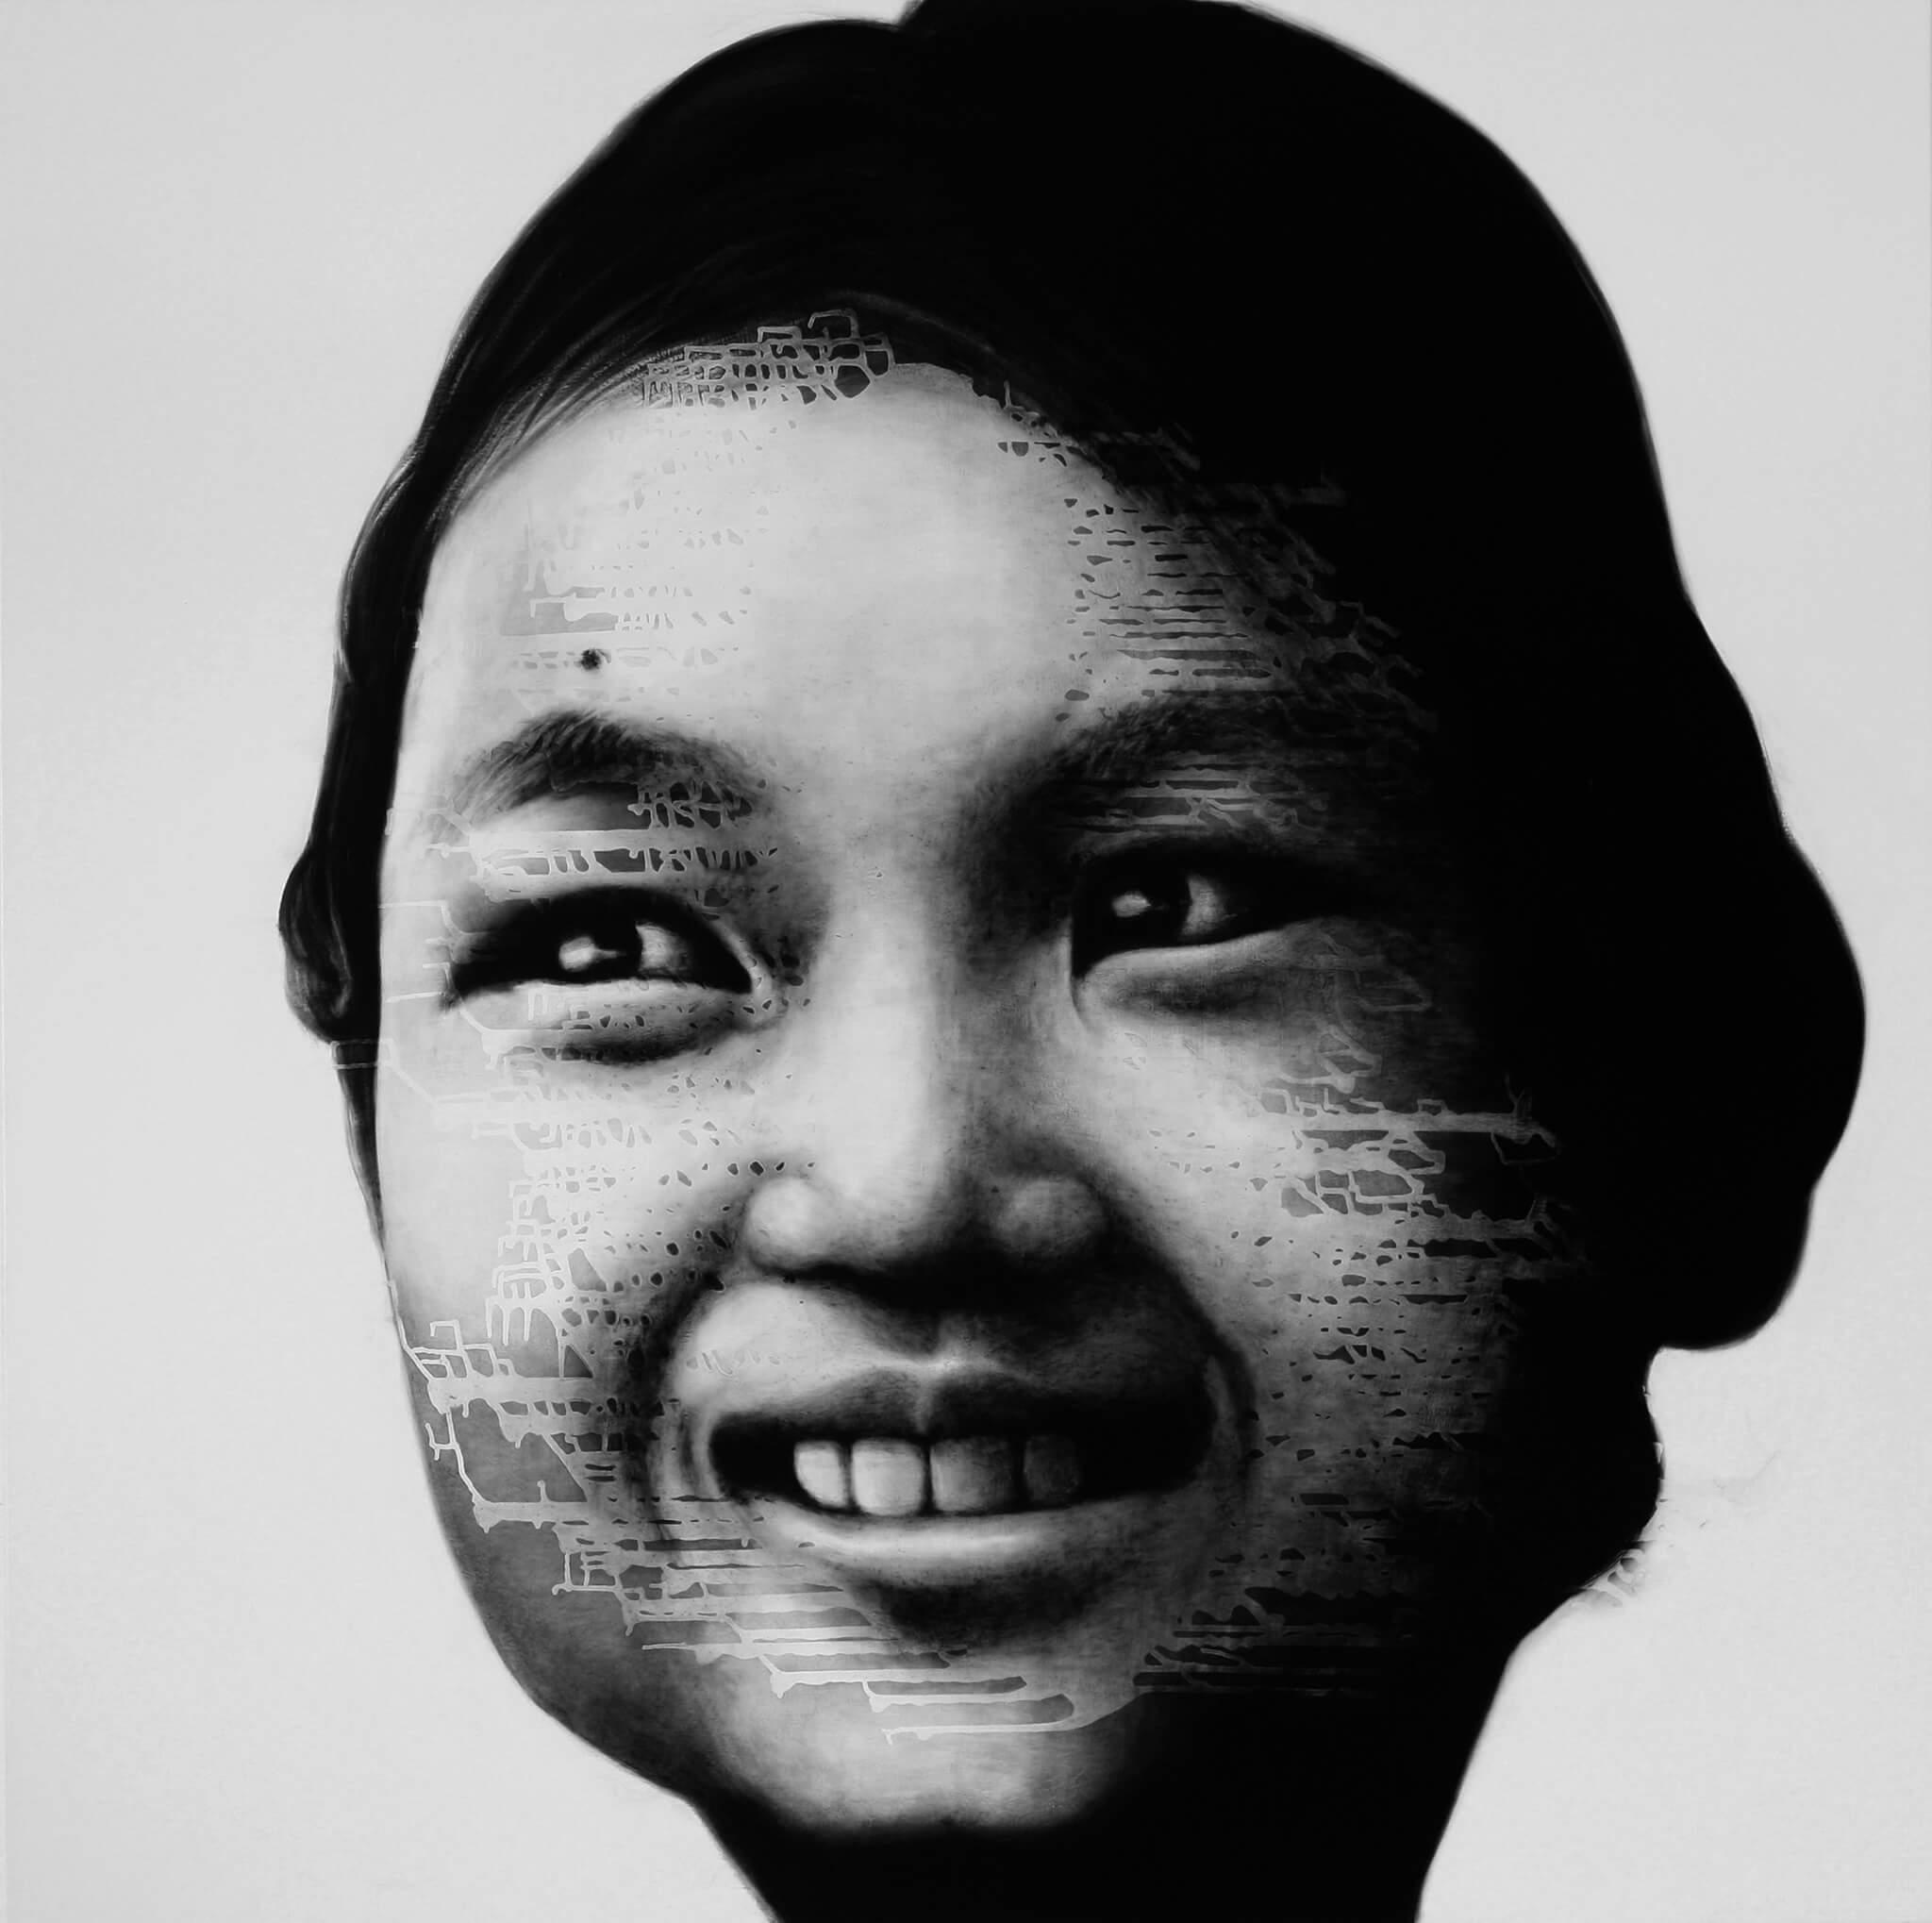 Tibetan girl, 2014